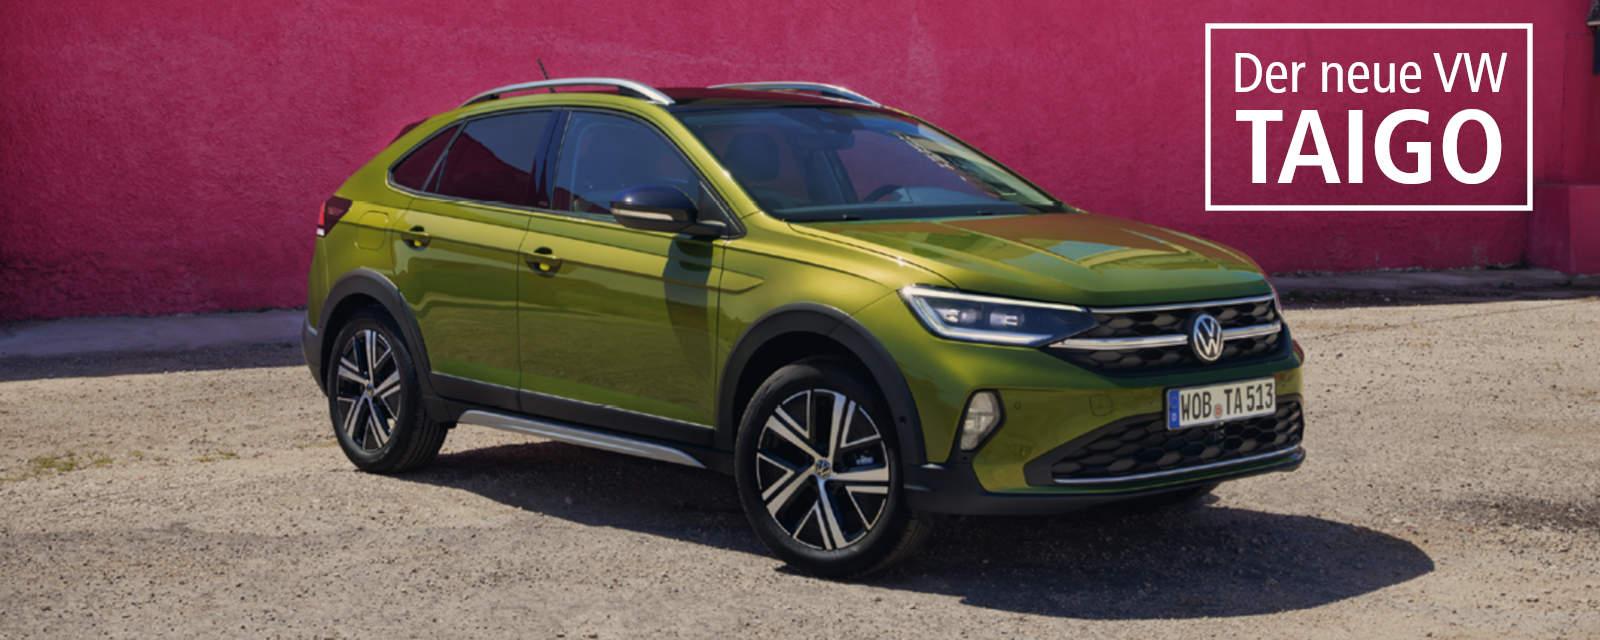 VW TAIGO: Das neuen SUV-Coupé - Leasing & Finanzierung